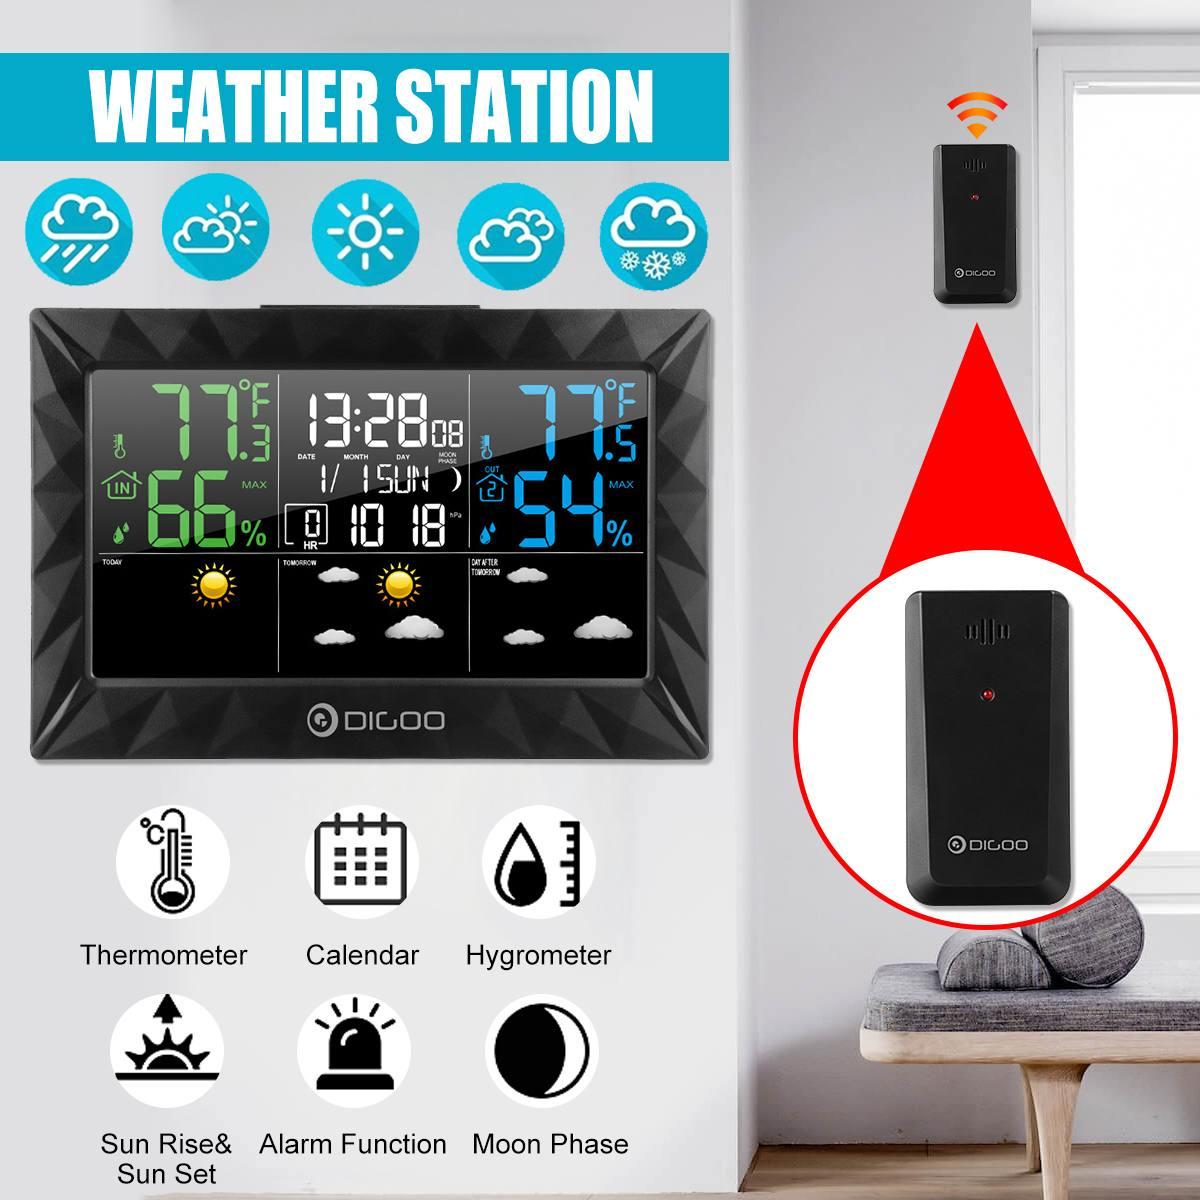 DIGOO DG-8270A Indoor Outdoor Weather Station + 100m Forecast Sensor Thermometer Hygrometer Meter Calendar 3CH Backlight Black